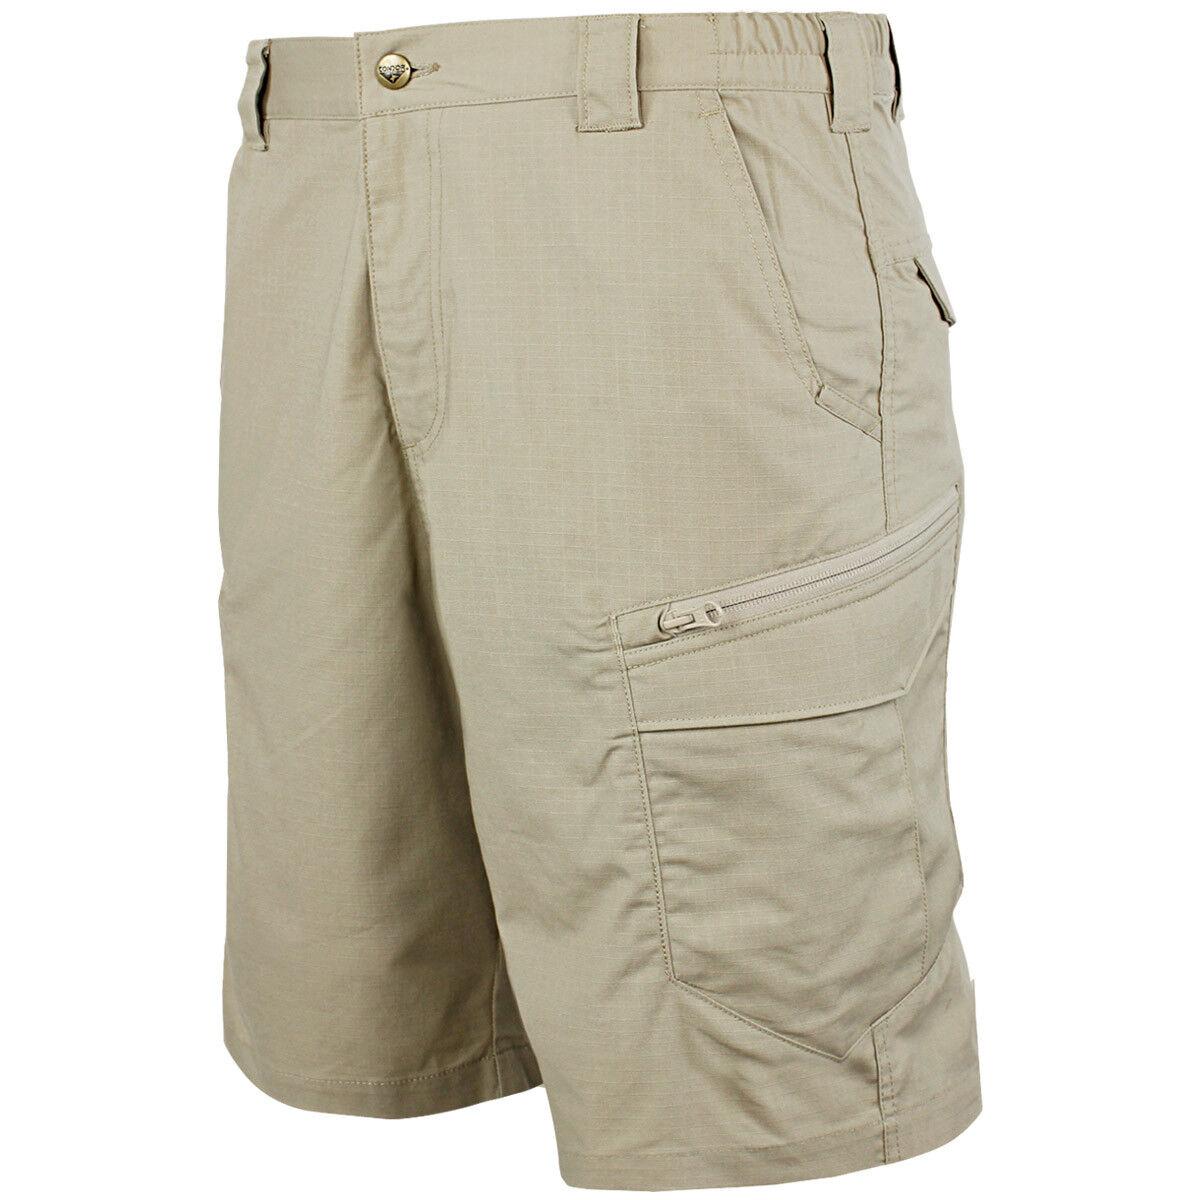 Condor Scout Mens Tactical Combat Cargo Shorts Hiking Fishing Short Pants Khaki